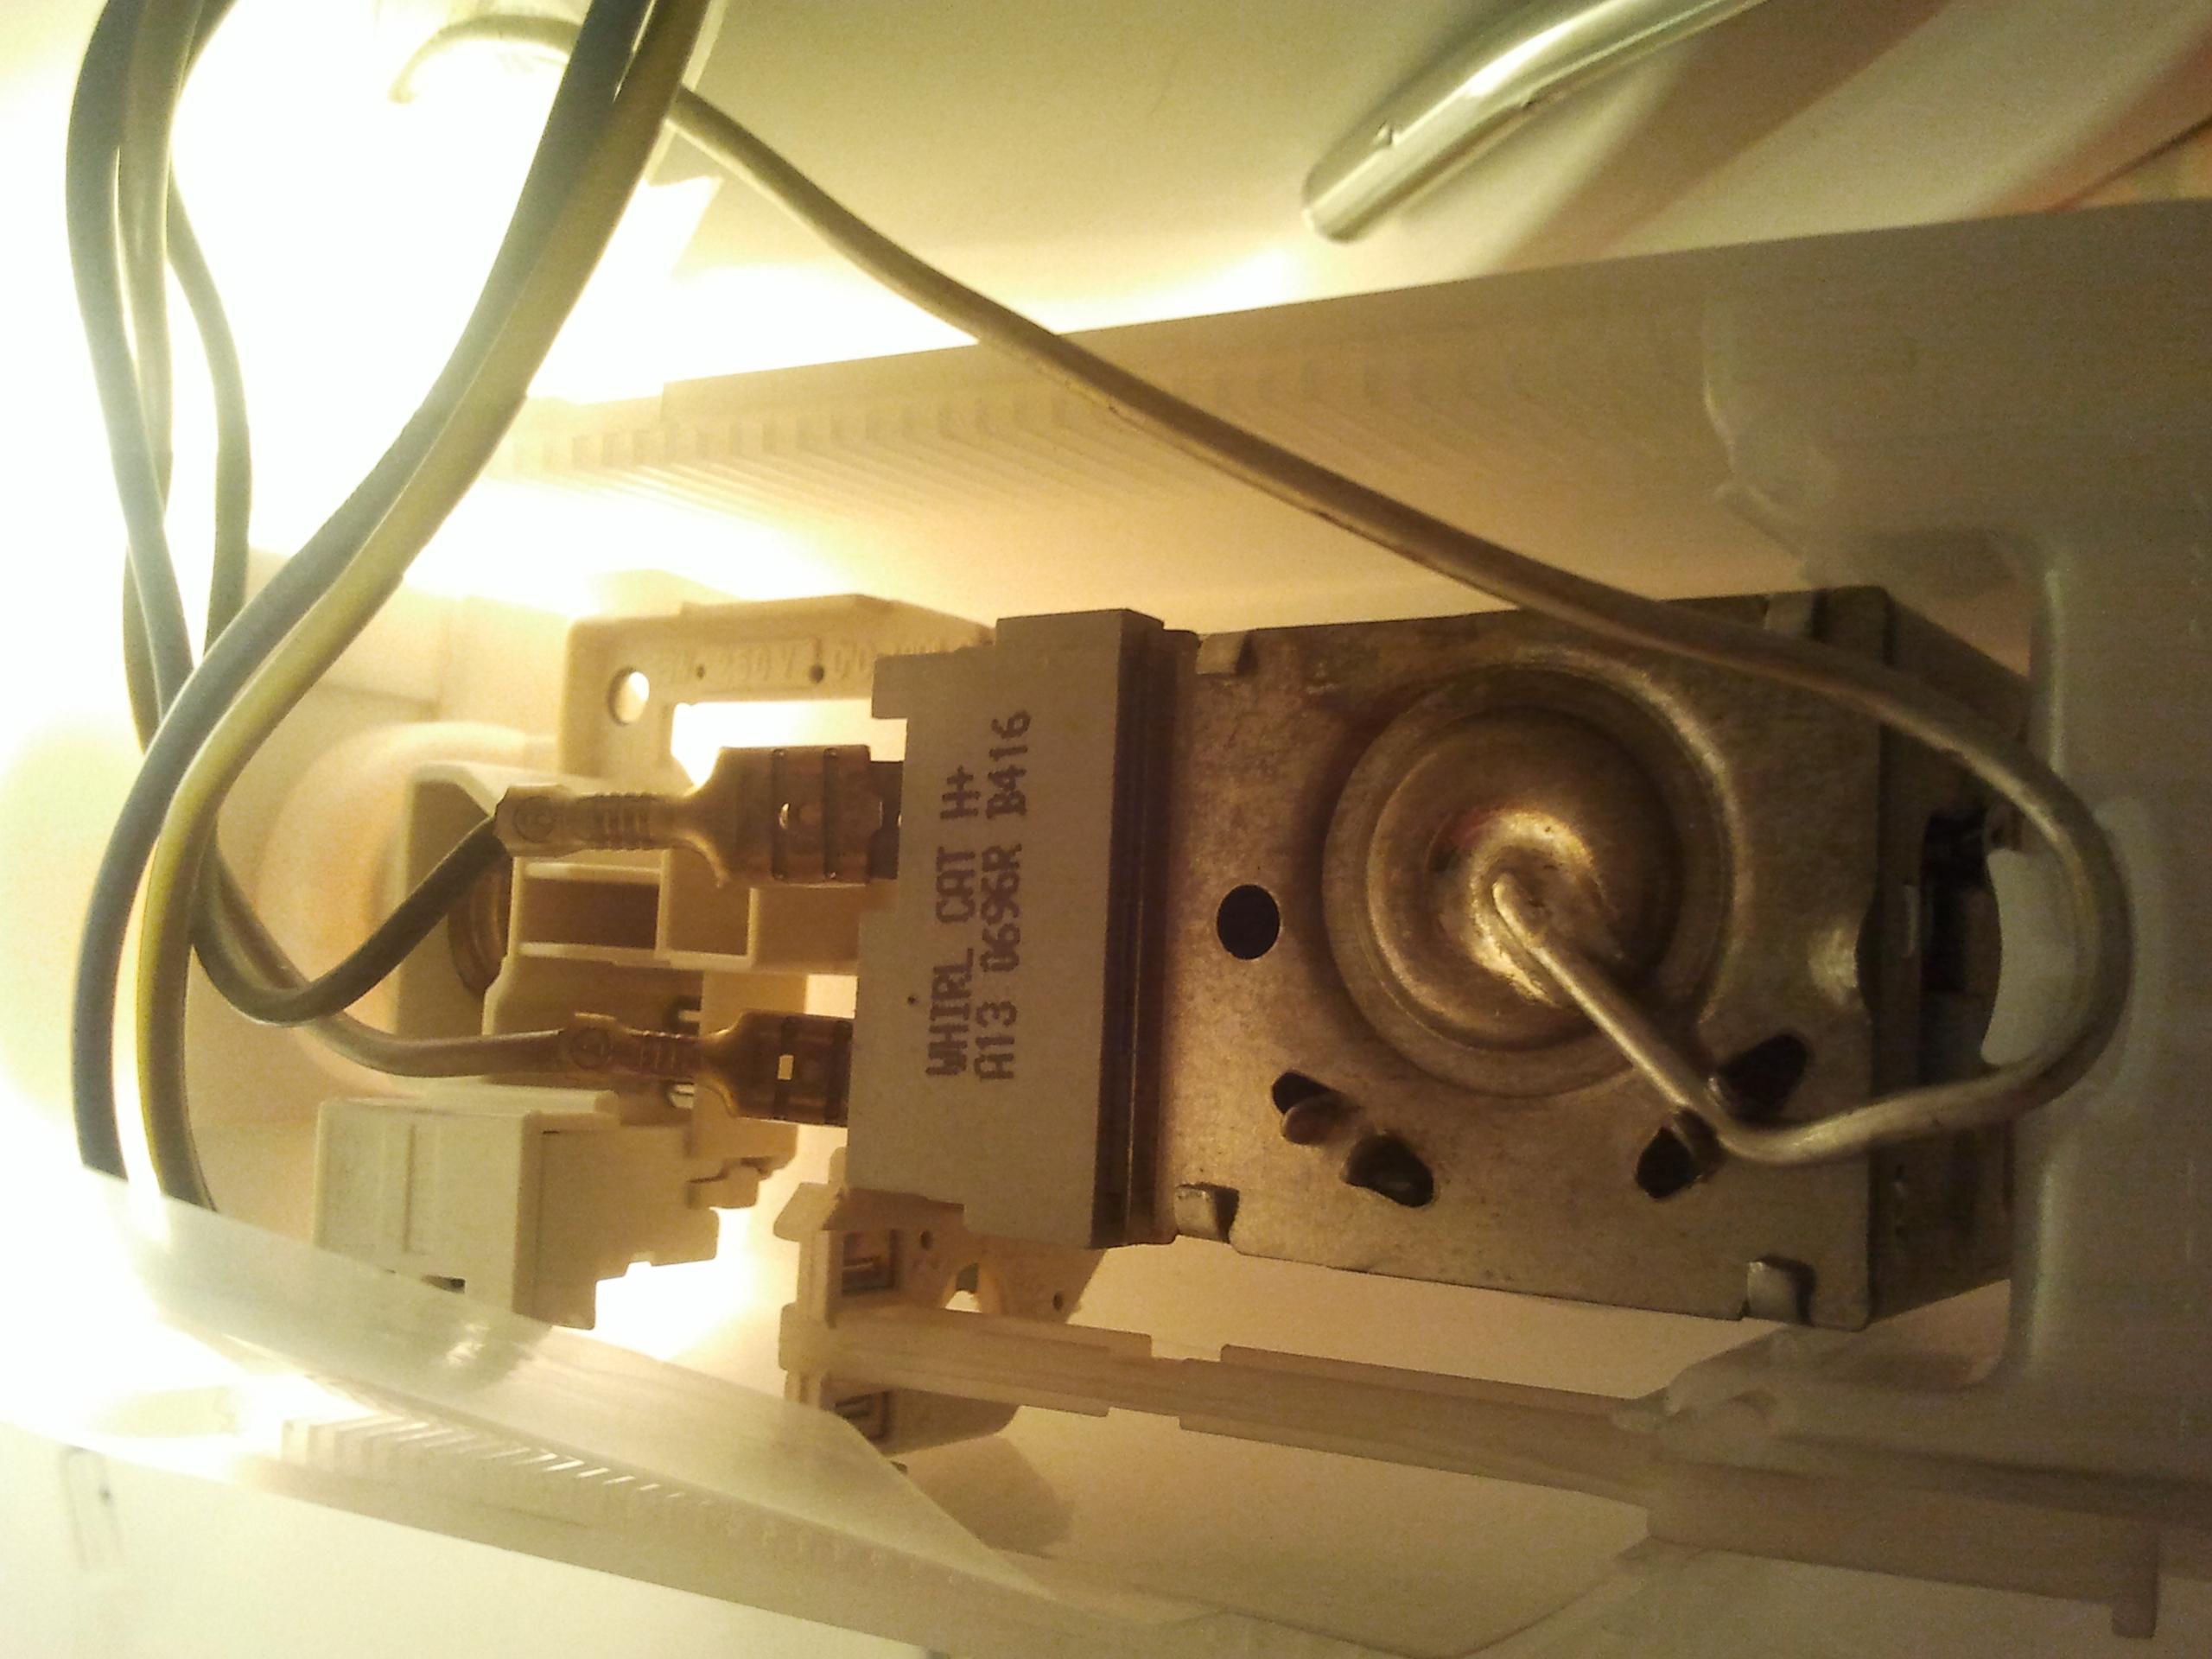 Whirlpool - zamiennik termostatu A13 0696